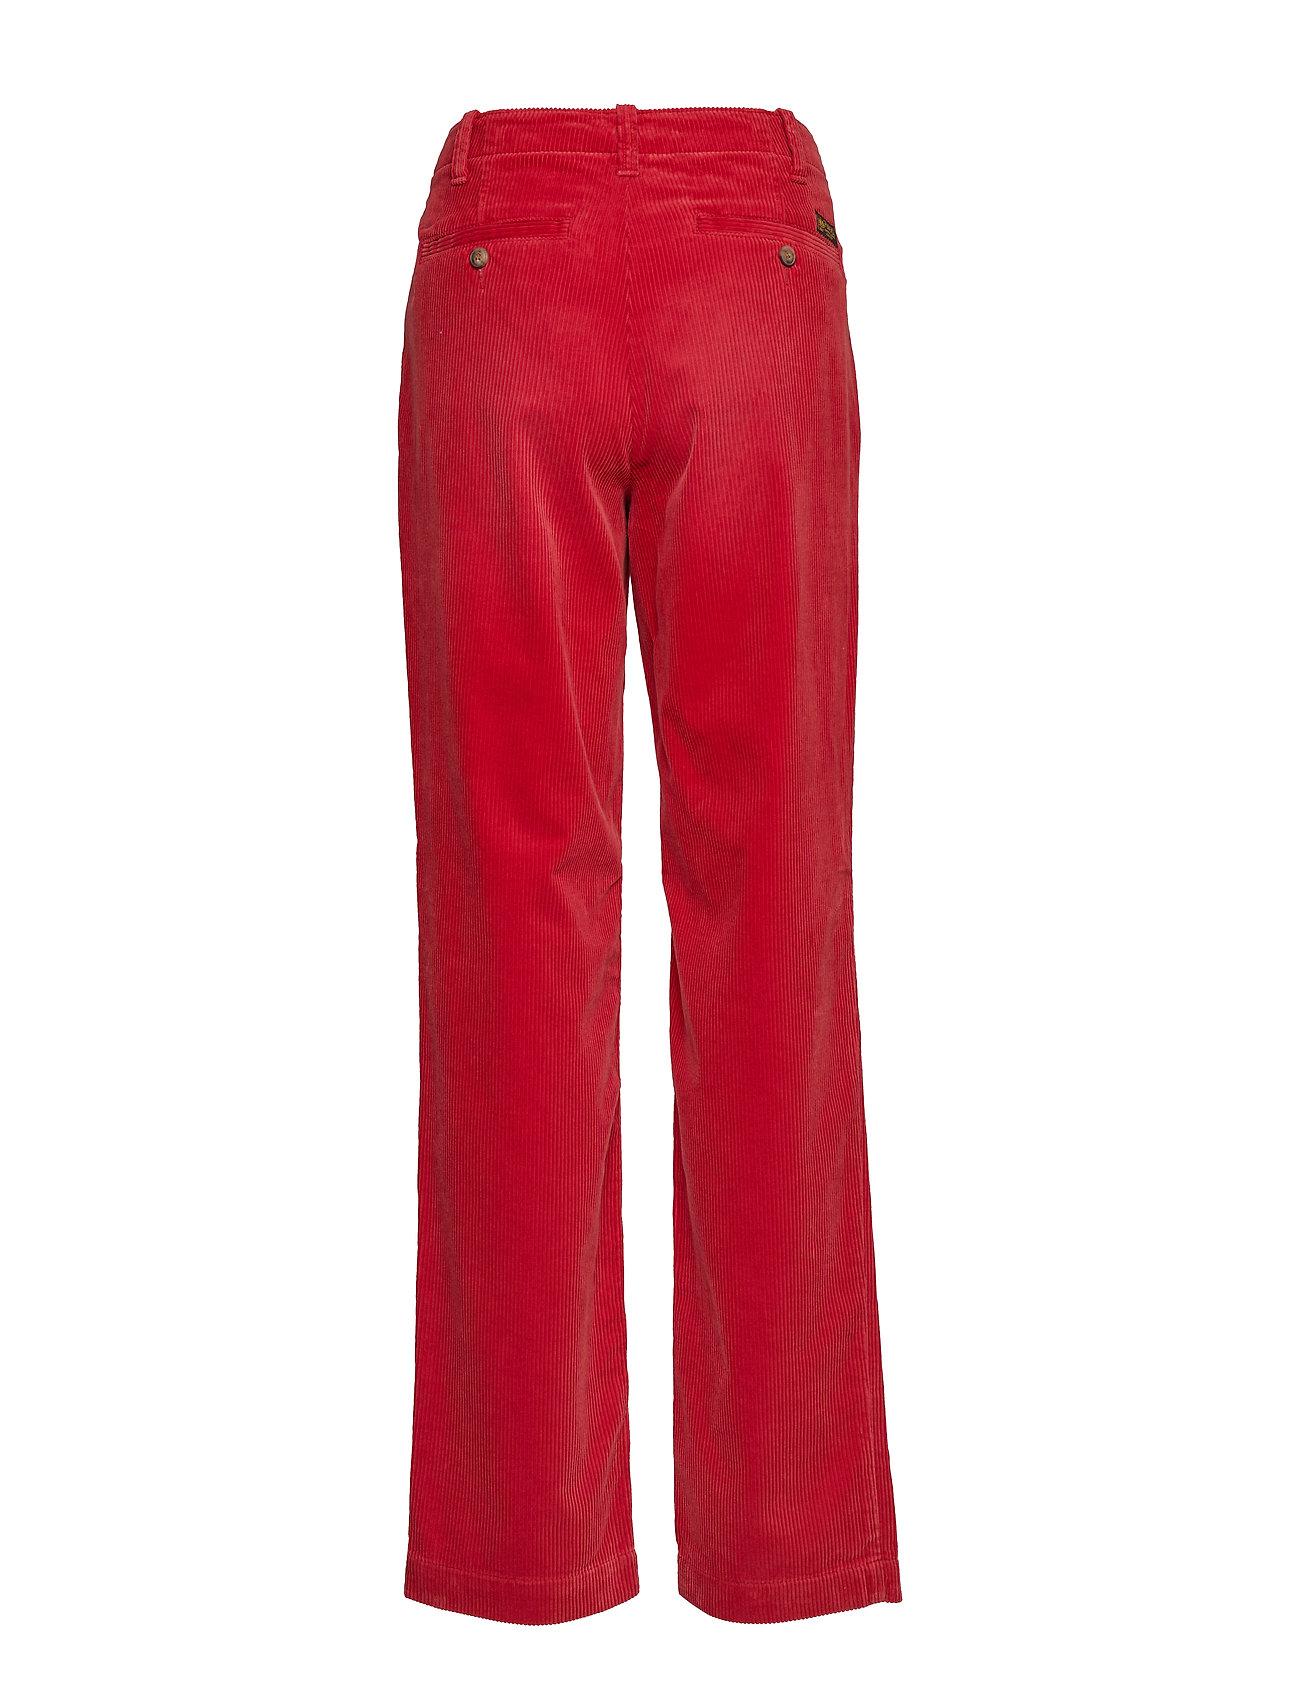 Corduroy Lauren RedPolo Cotton Ralph Straight Pantnew 35RAj4Lq